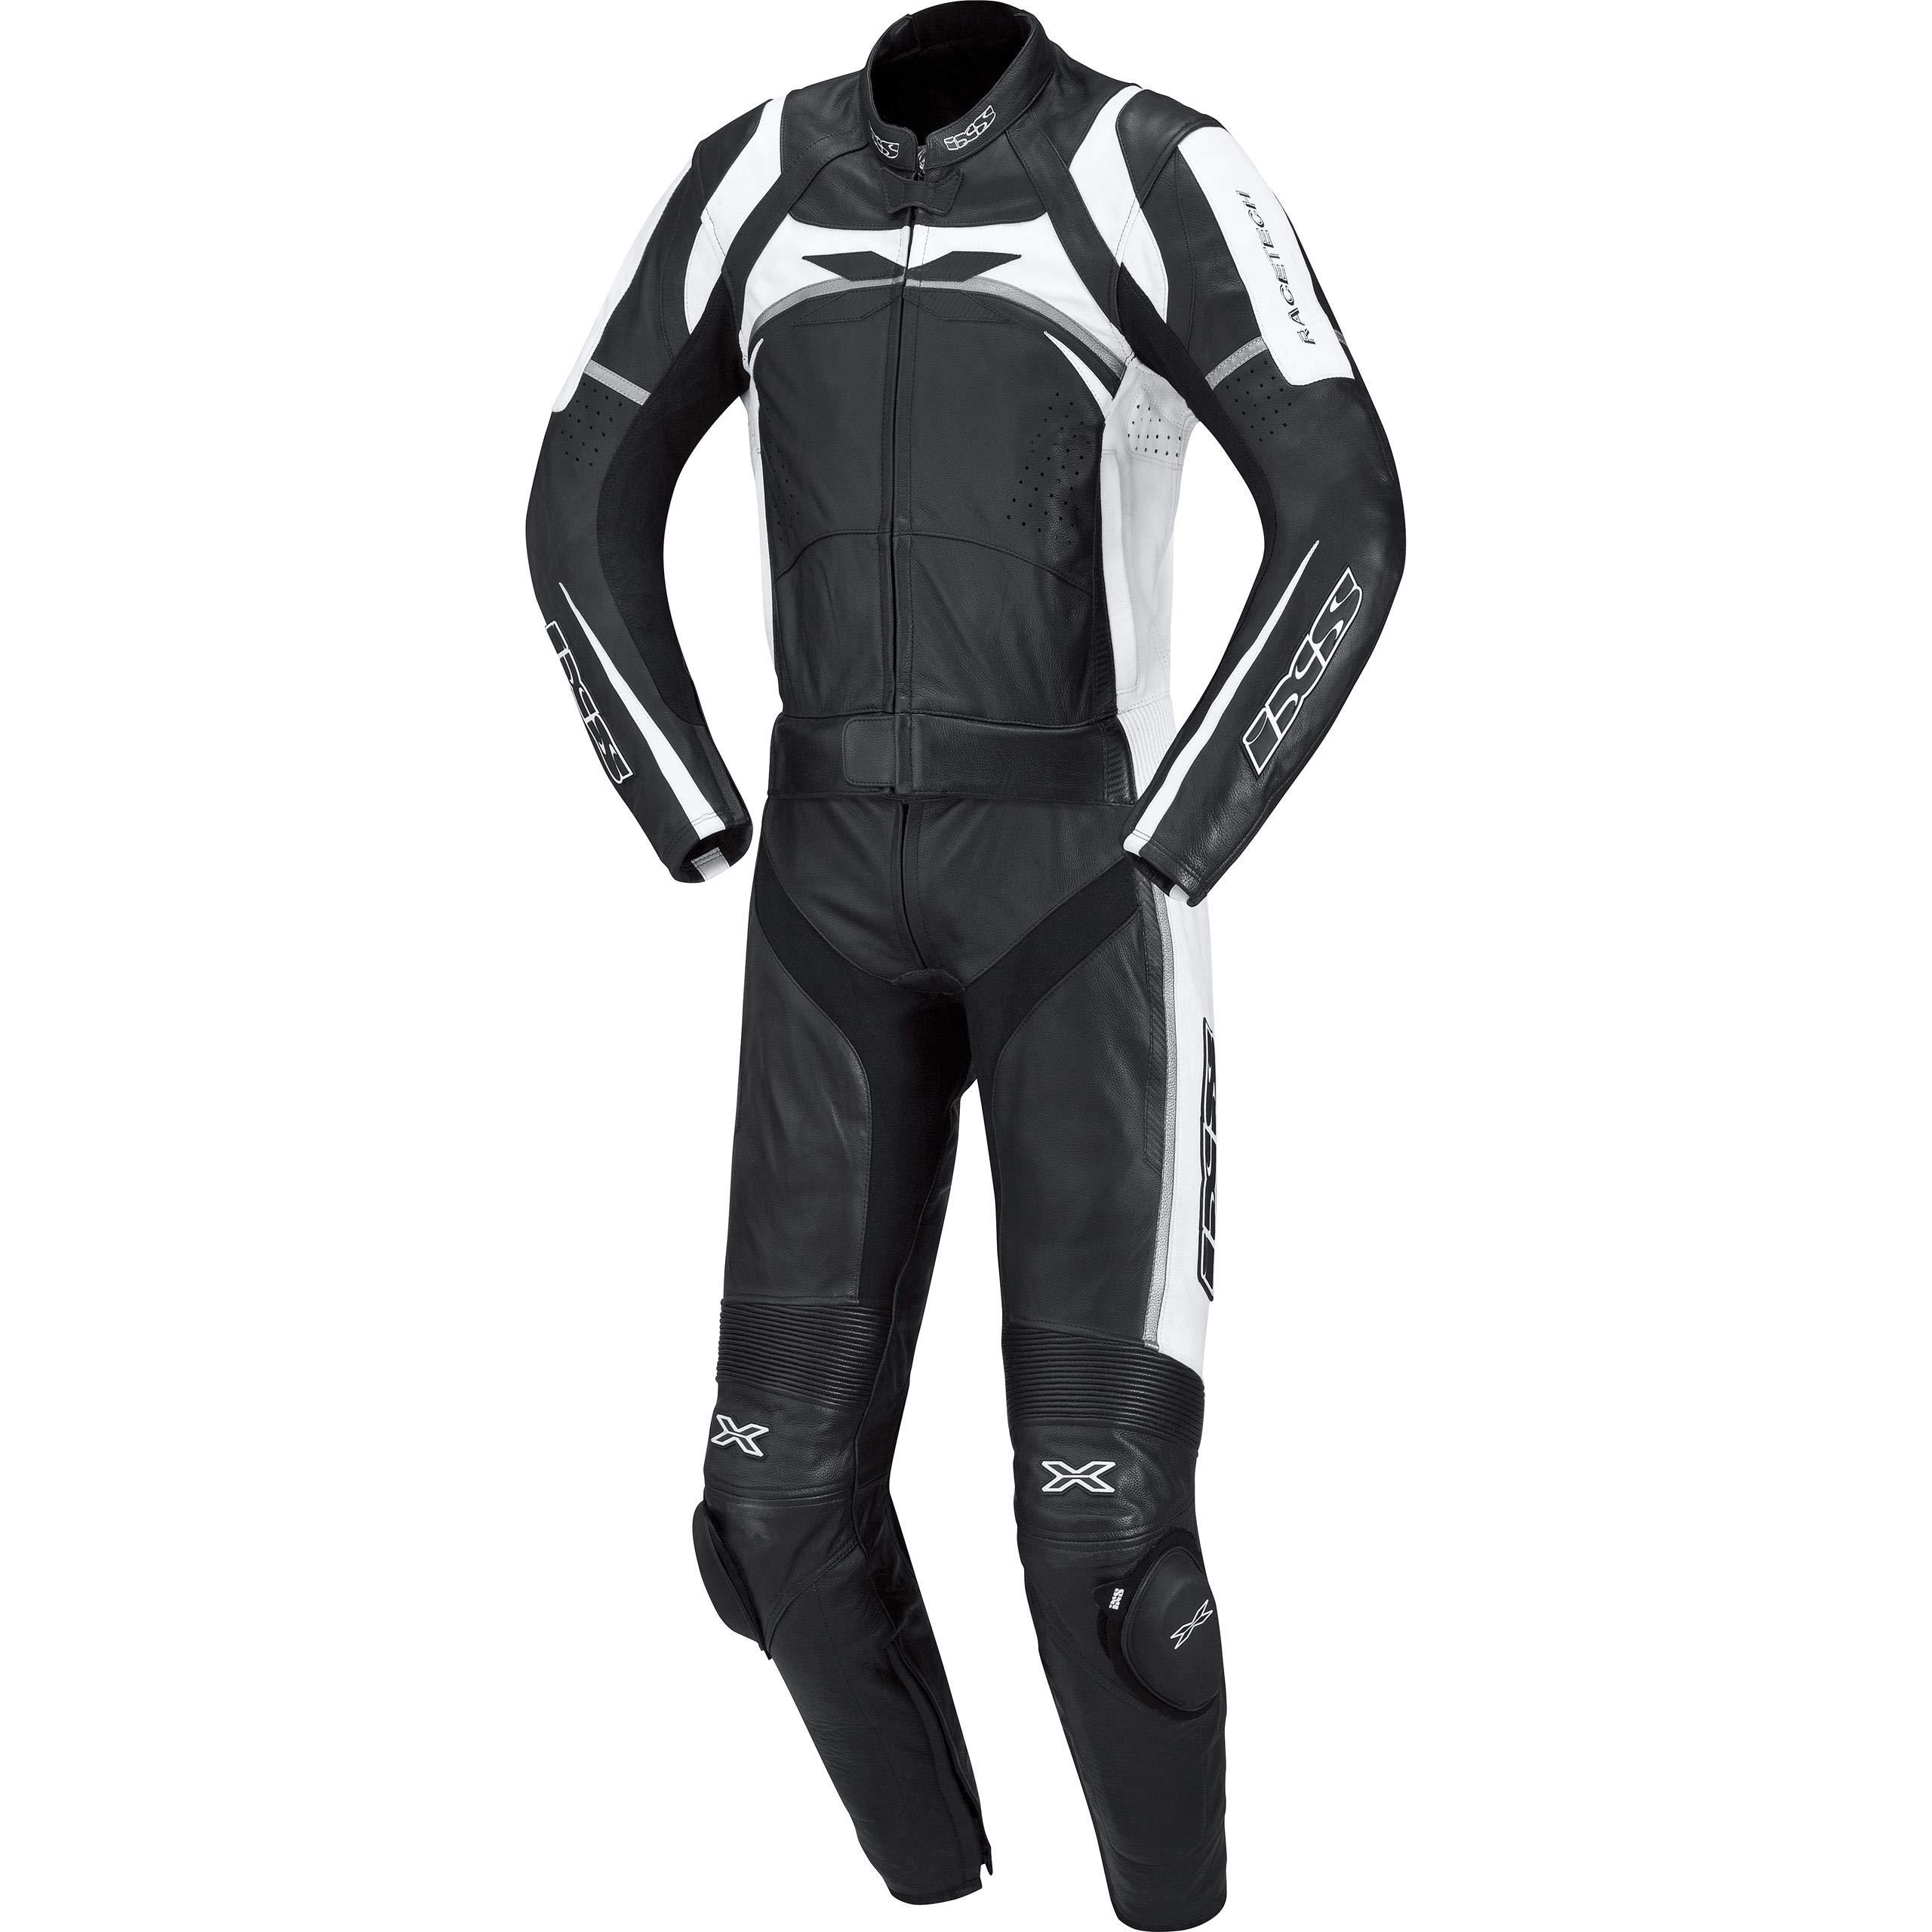 IXS CAMARO 2-Piece Suit (Black/White/Silver, US Size 42/EU Size 52)